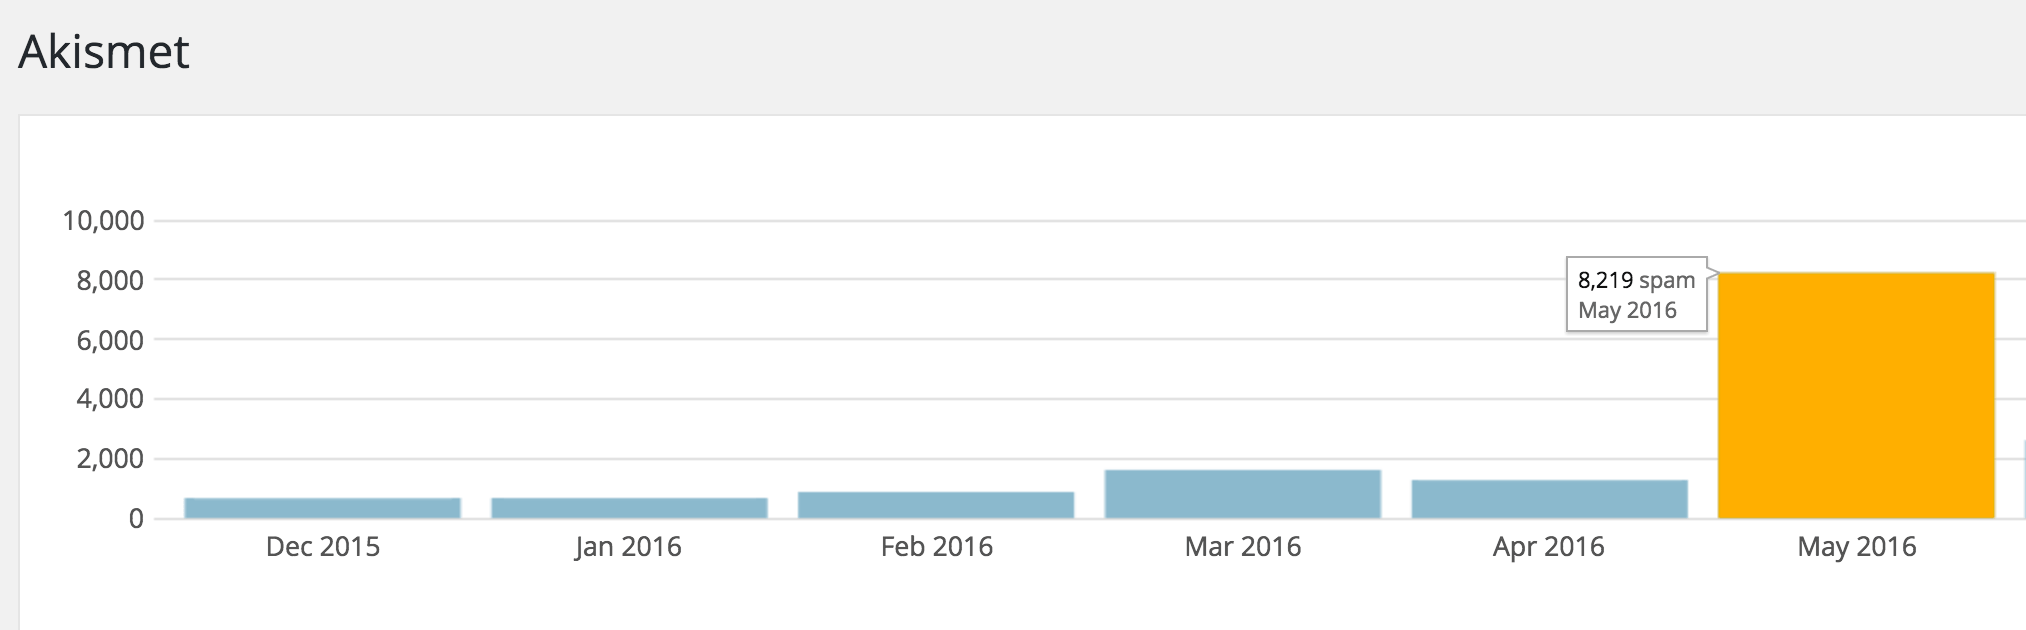 Akismet Spam Summary Graph